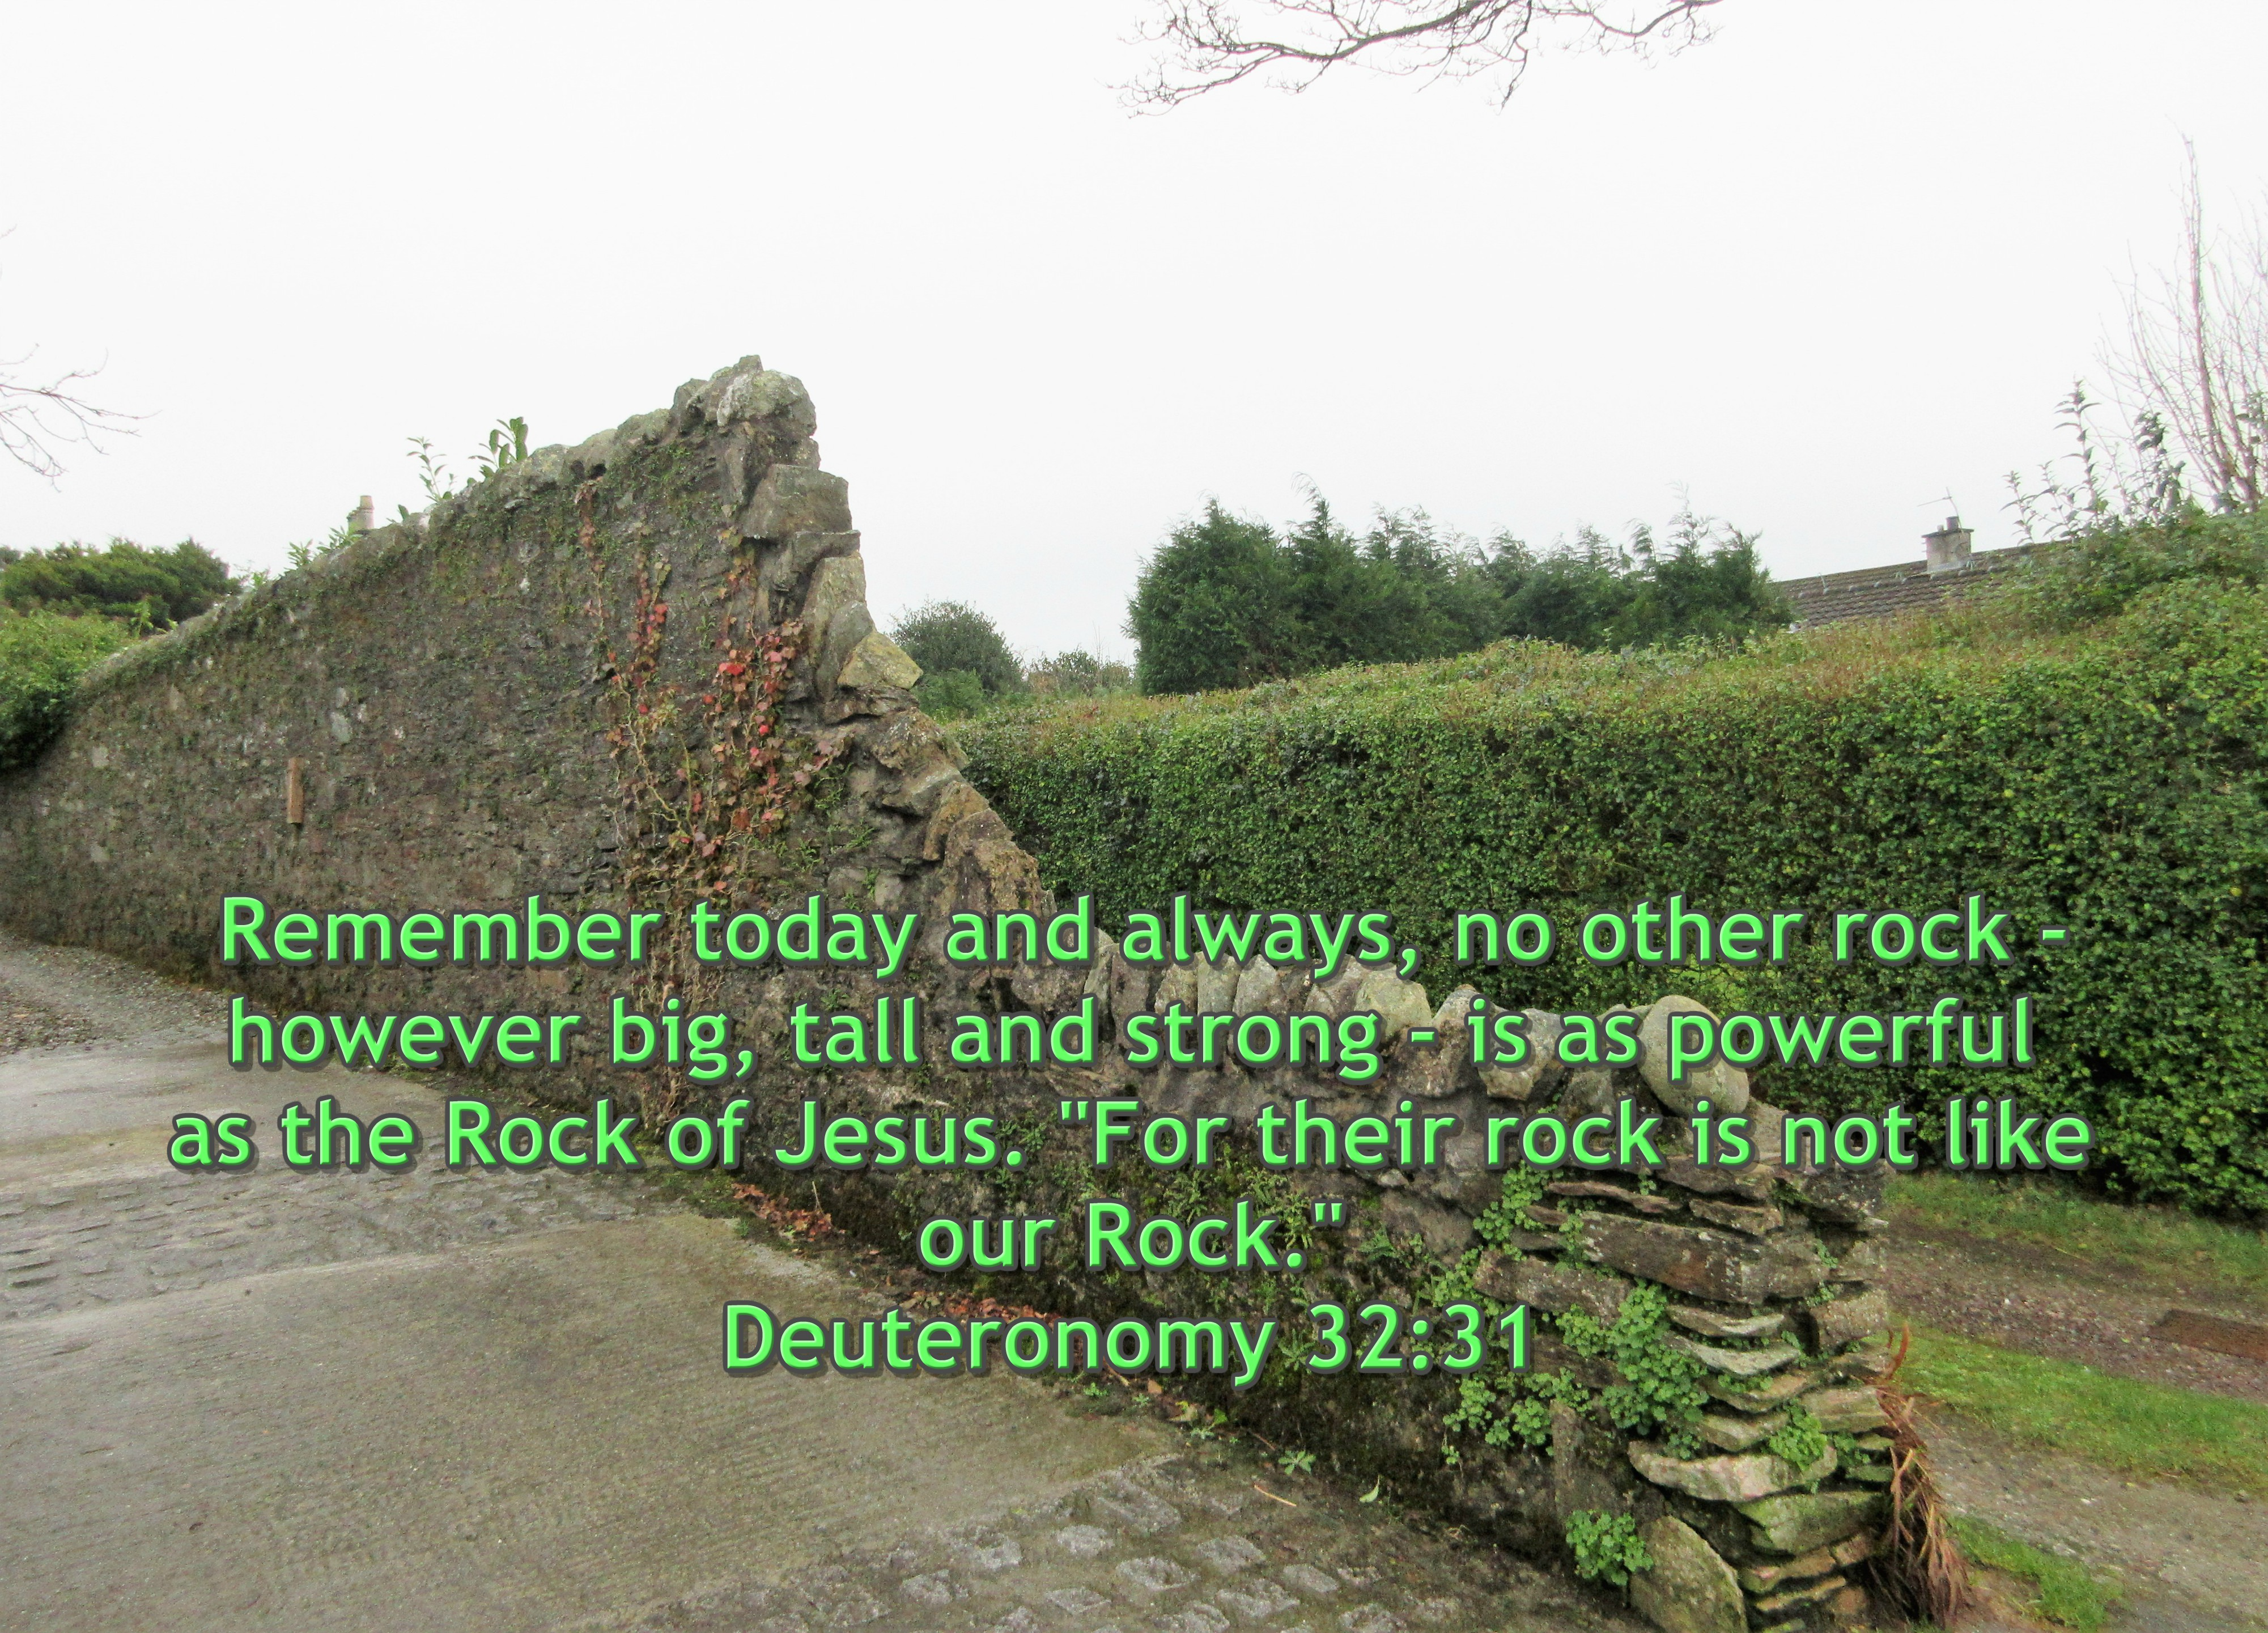 Rock of Jesus